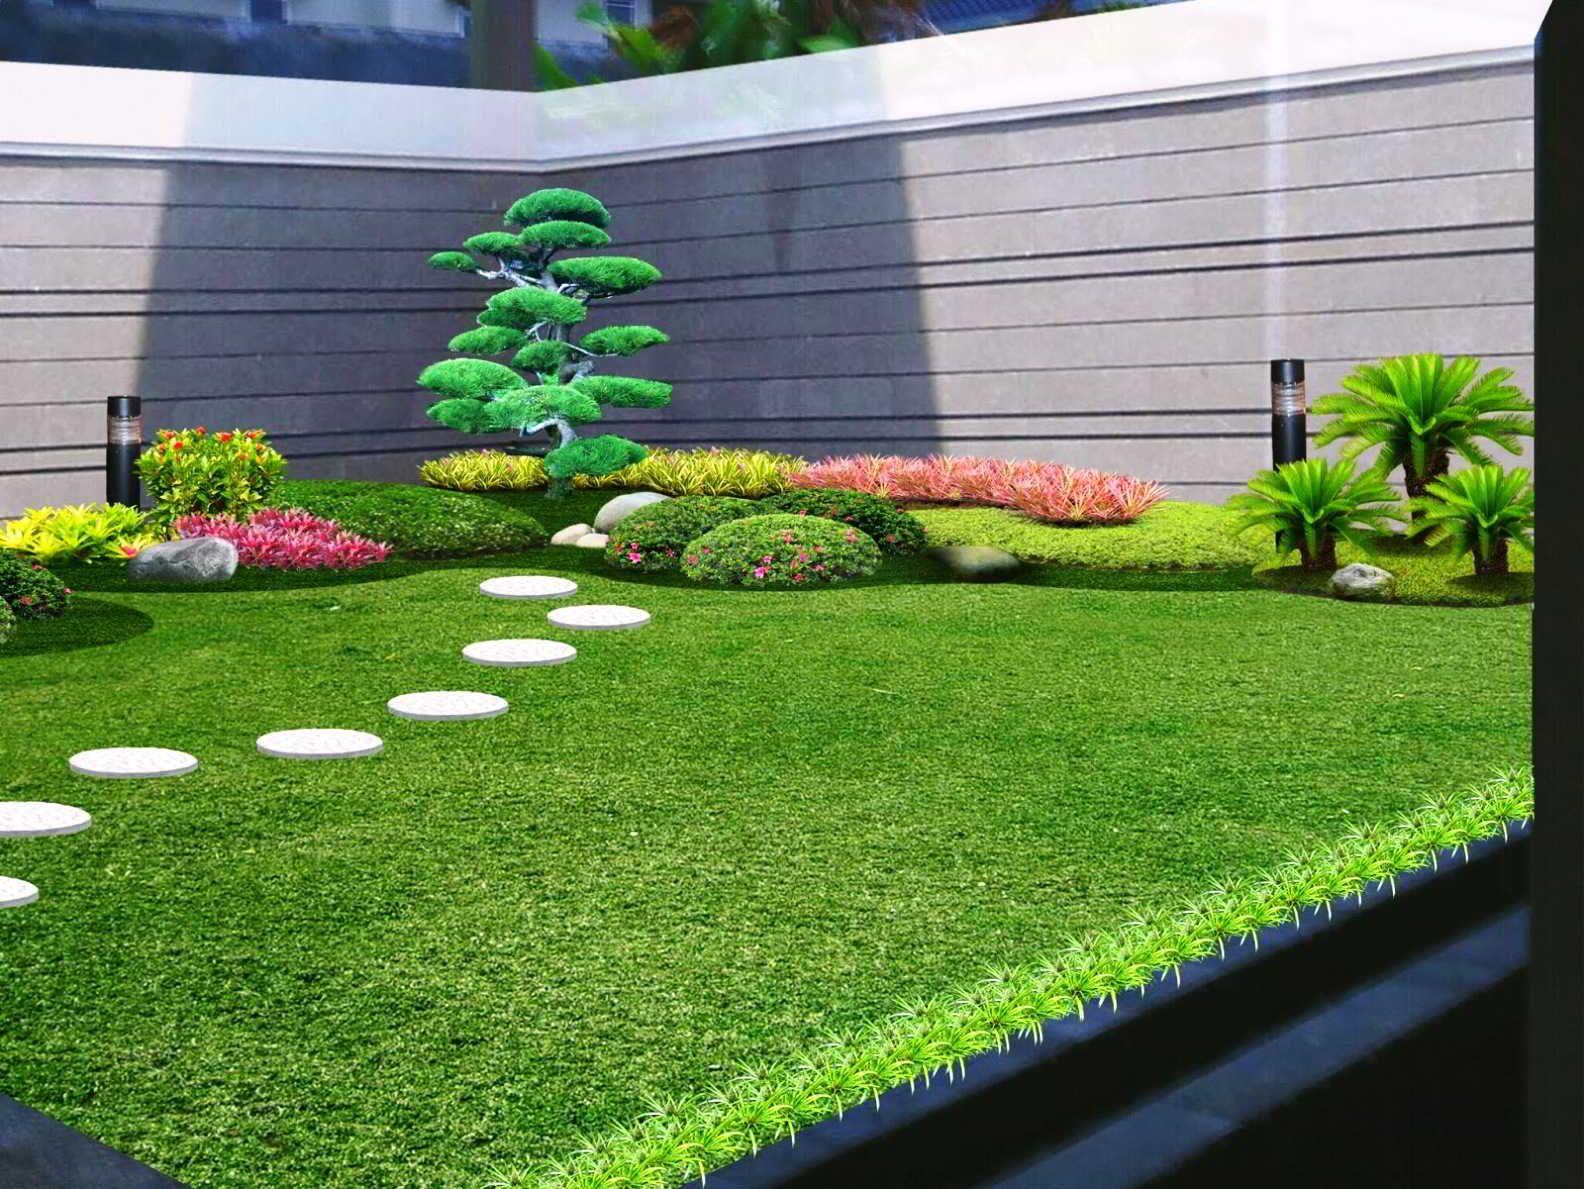 30 Desain Taman Minimalis Modern Ideas | Garden Design, Minimalist Garden,  Small Garden Design